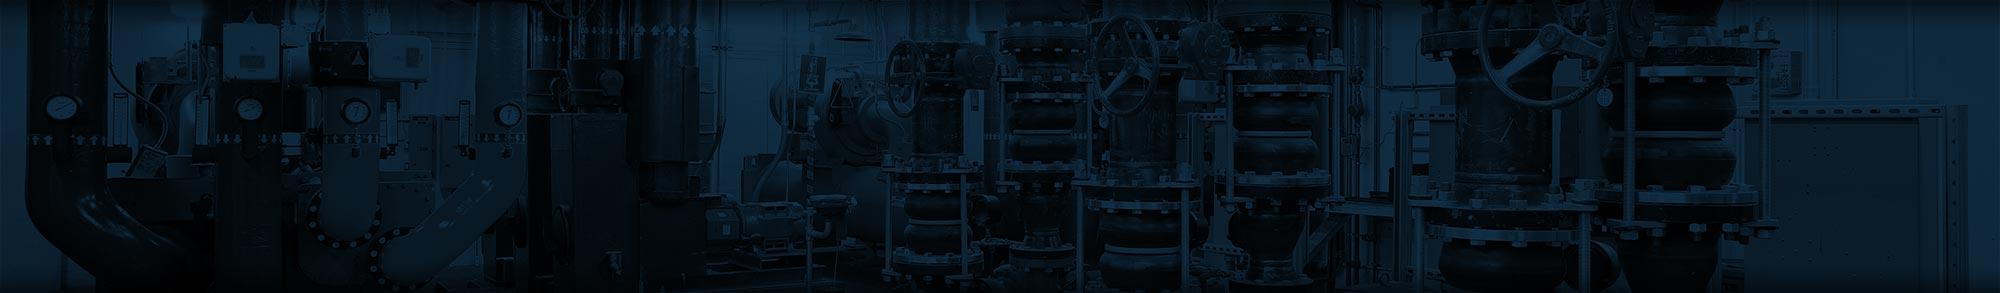 Markets Amp Experience U S Engineering Mechanical